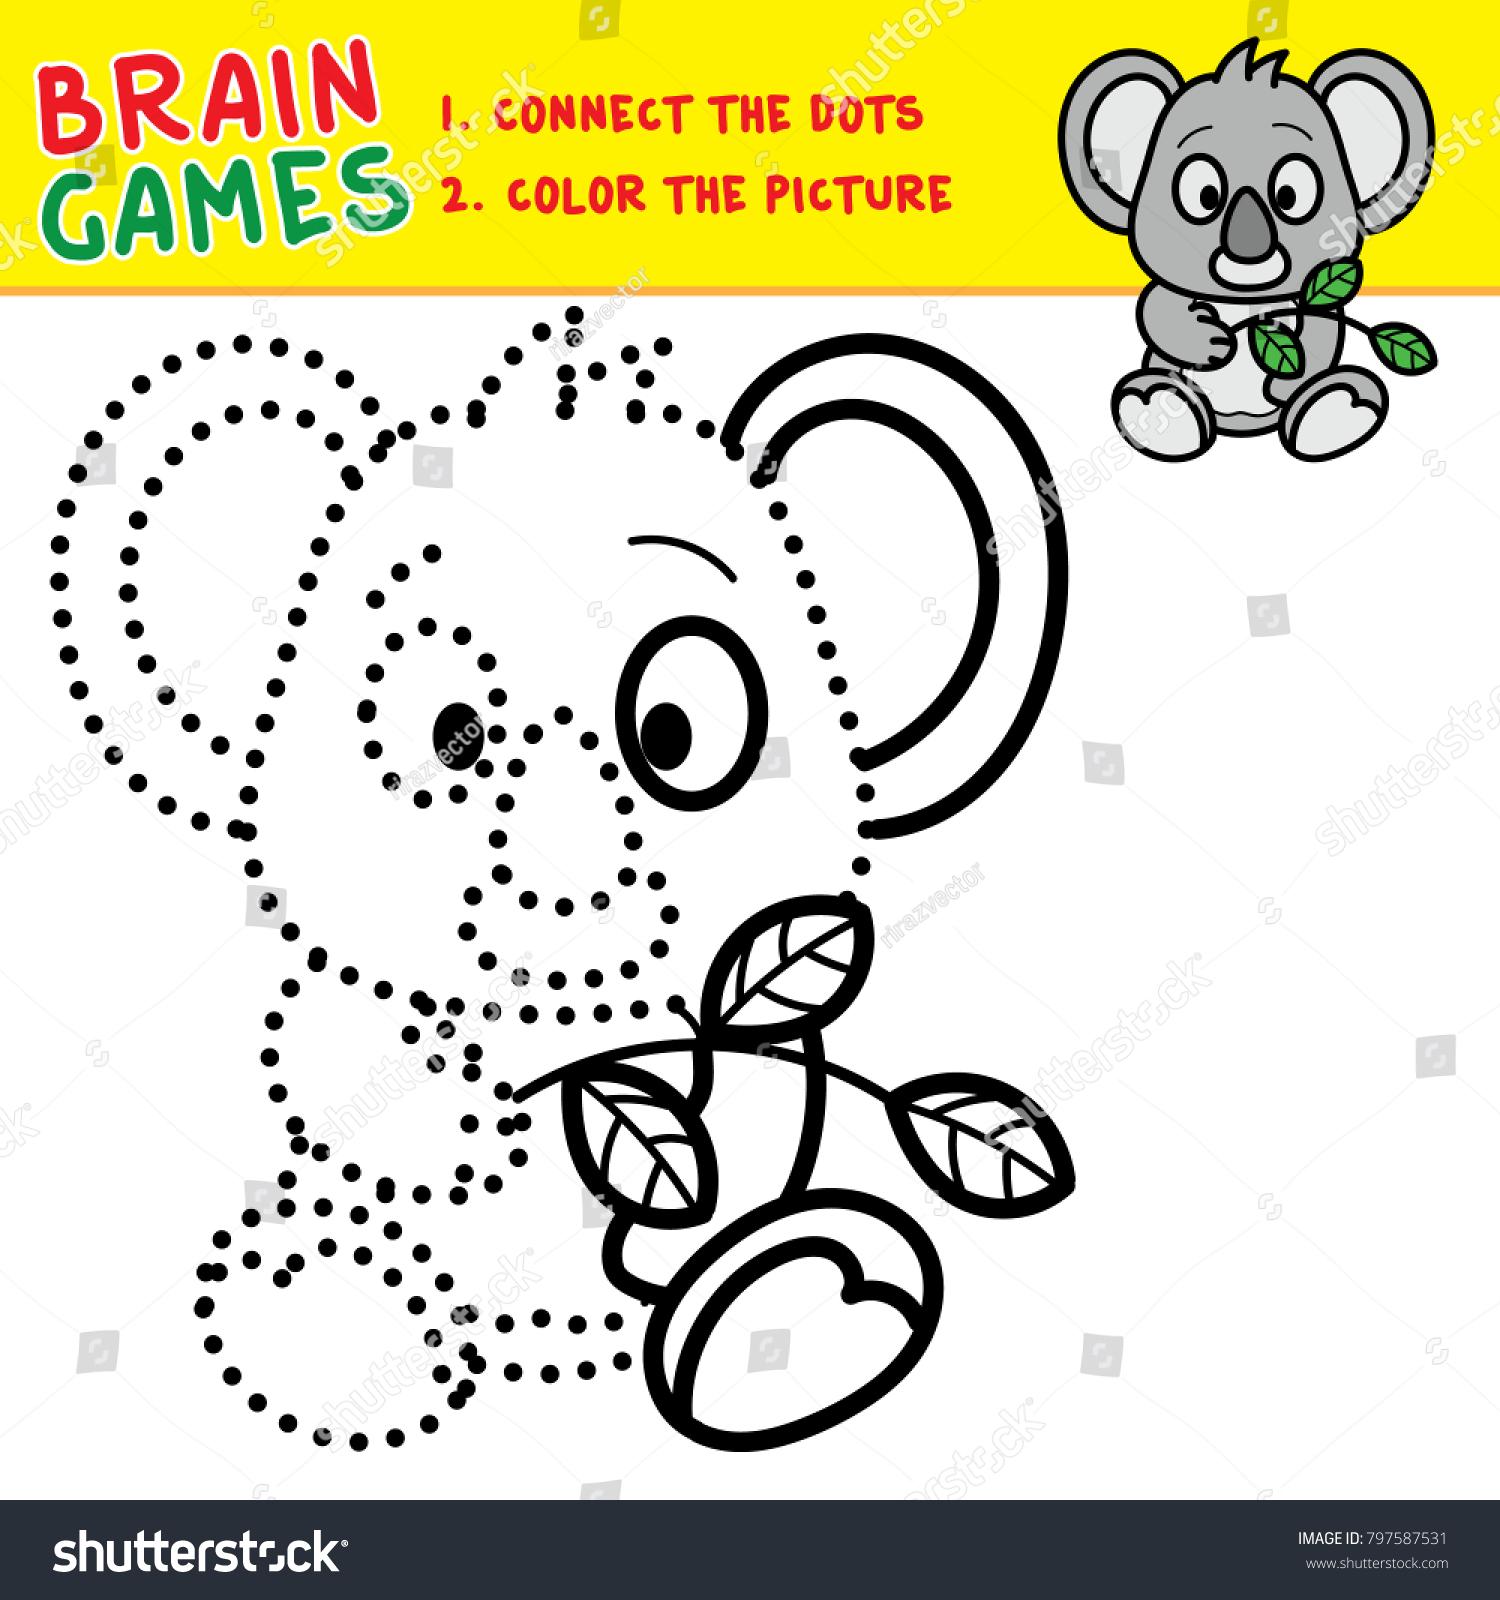 koala coloring page kids brain games stock vector royalty free 797587531 https www shutterstock com image vector koala coloring page kids brain games 797587531